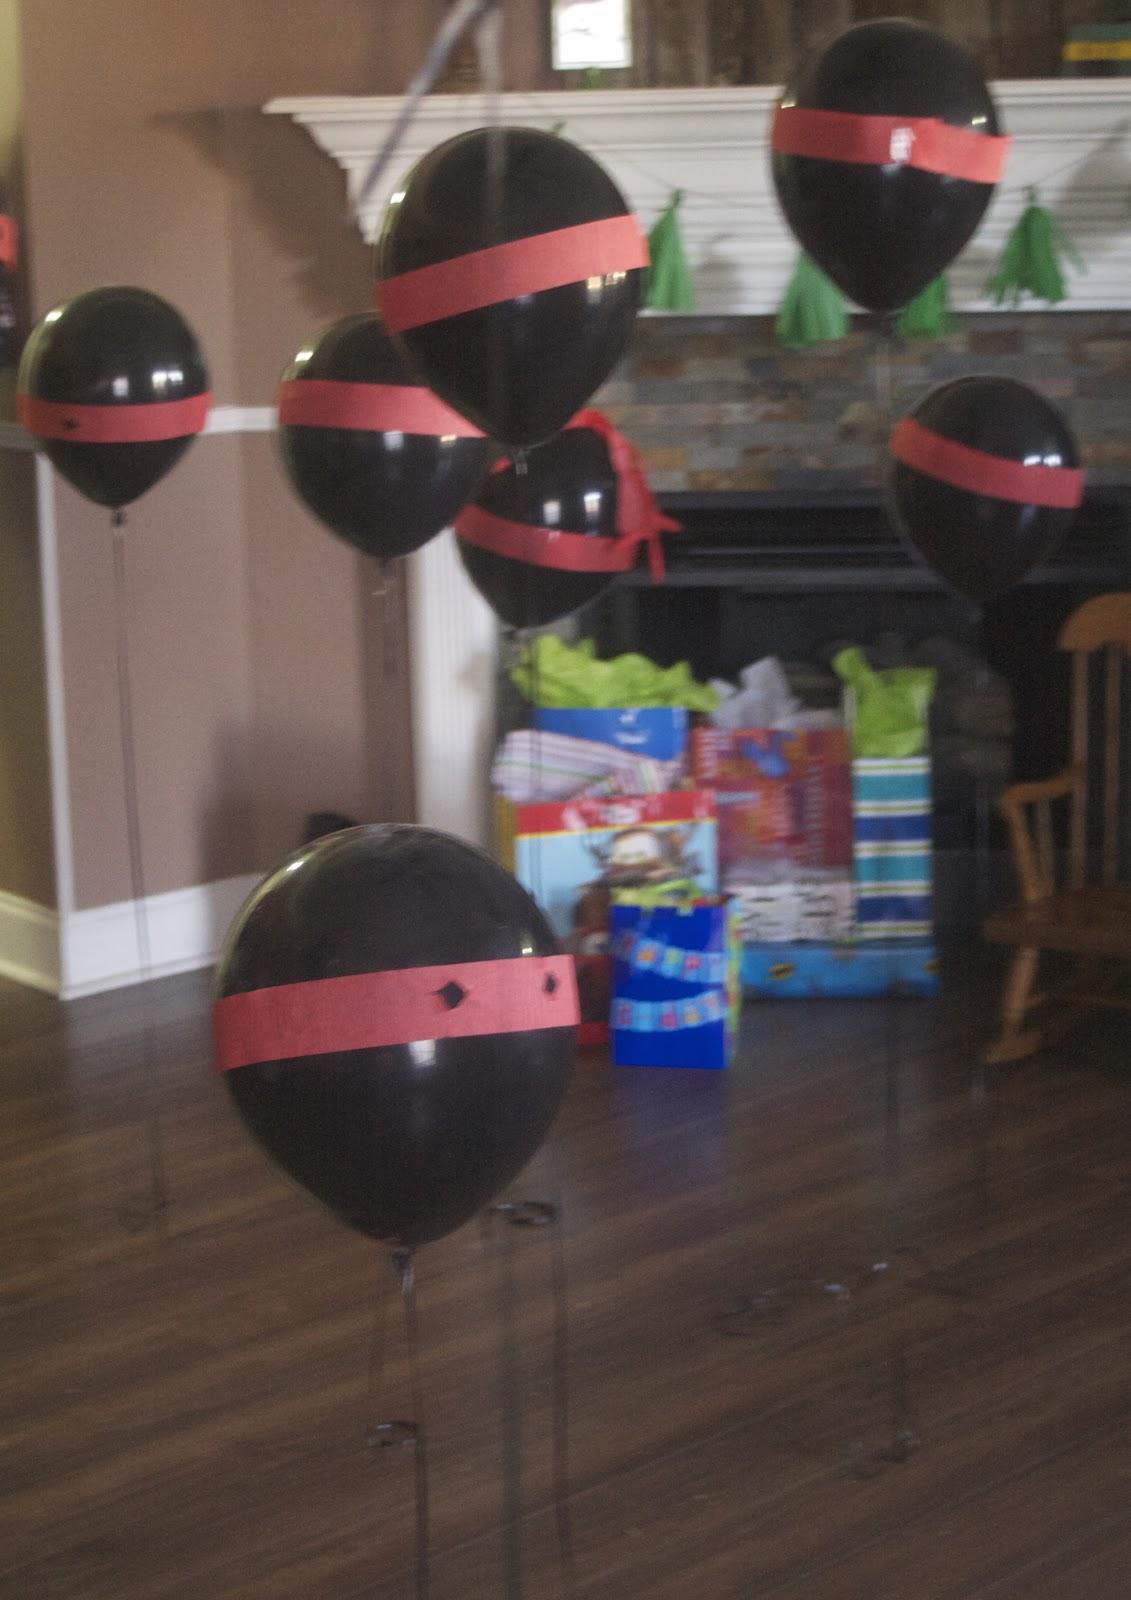 DIY Ninja Party Games for your little ninja's Birthday!